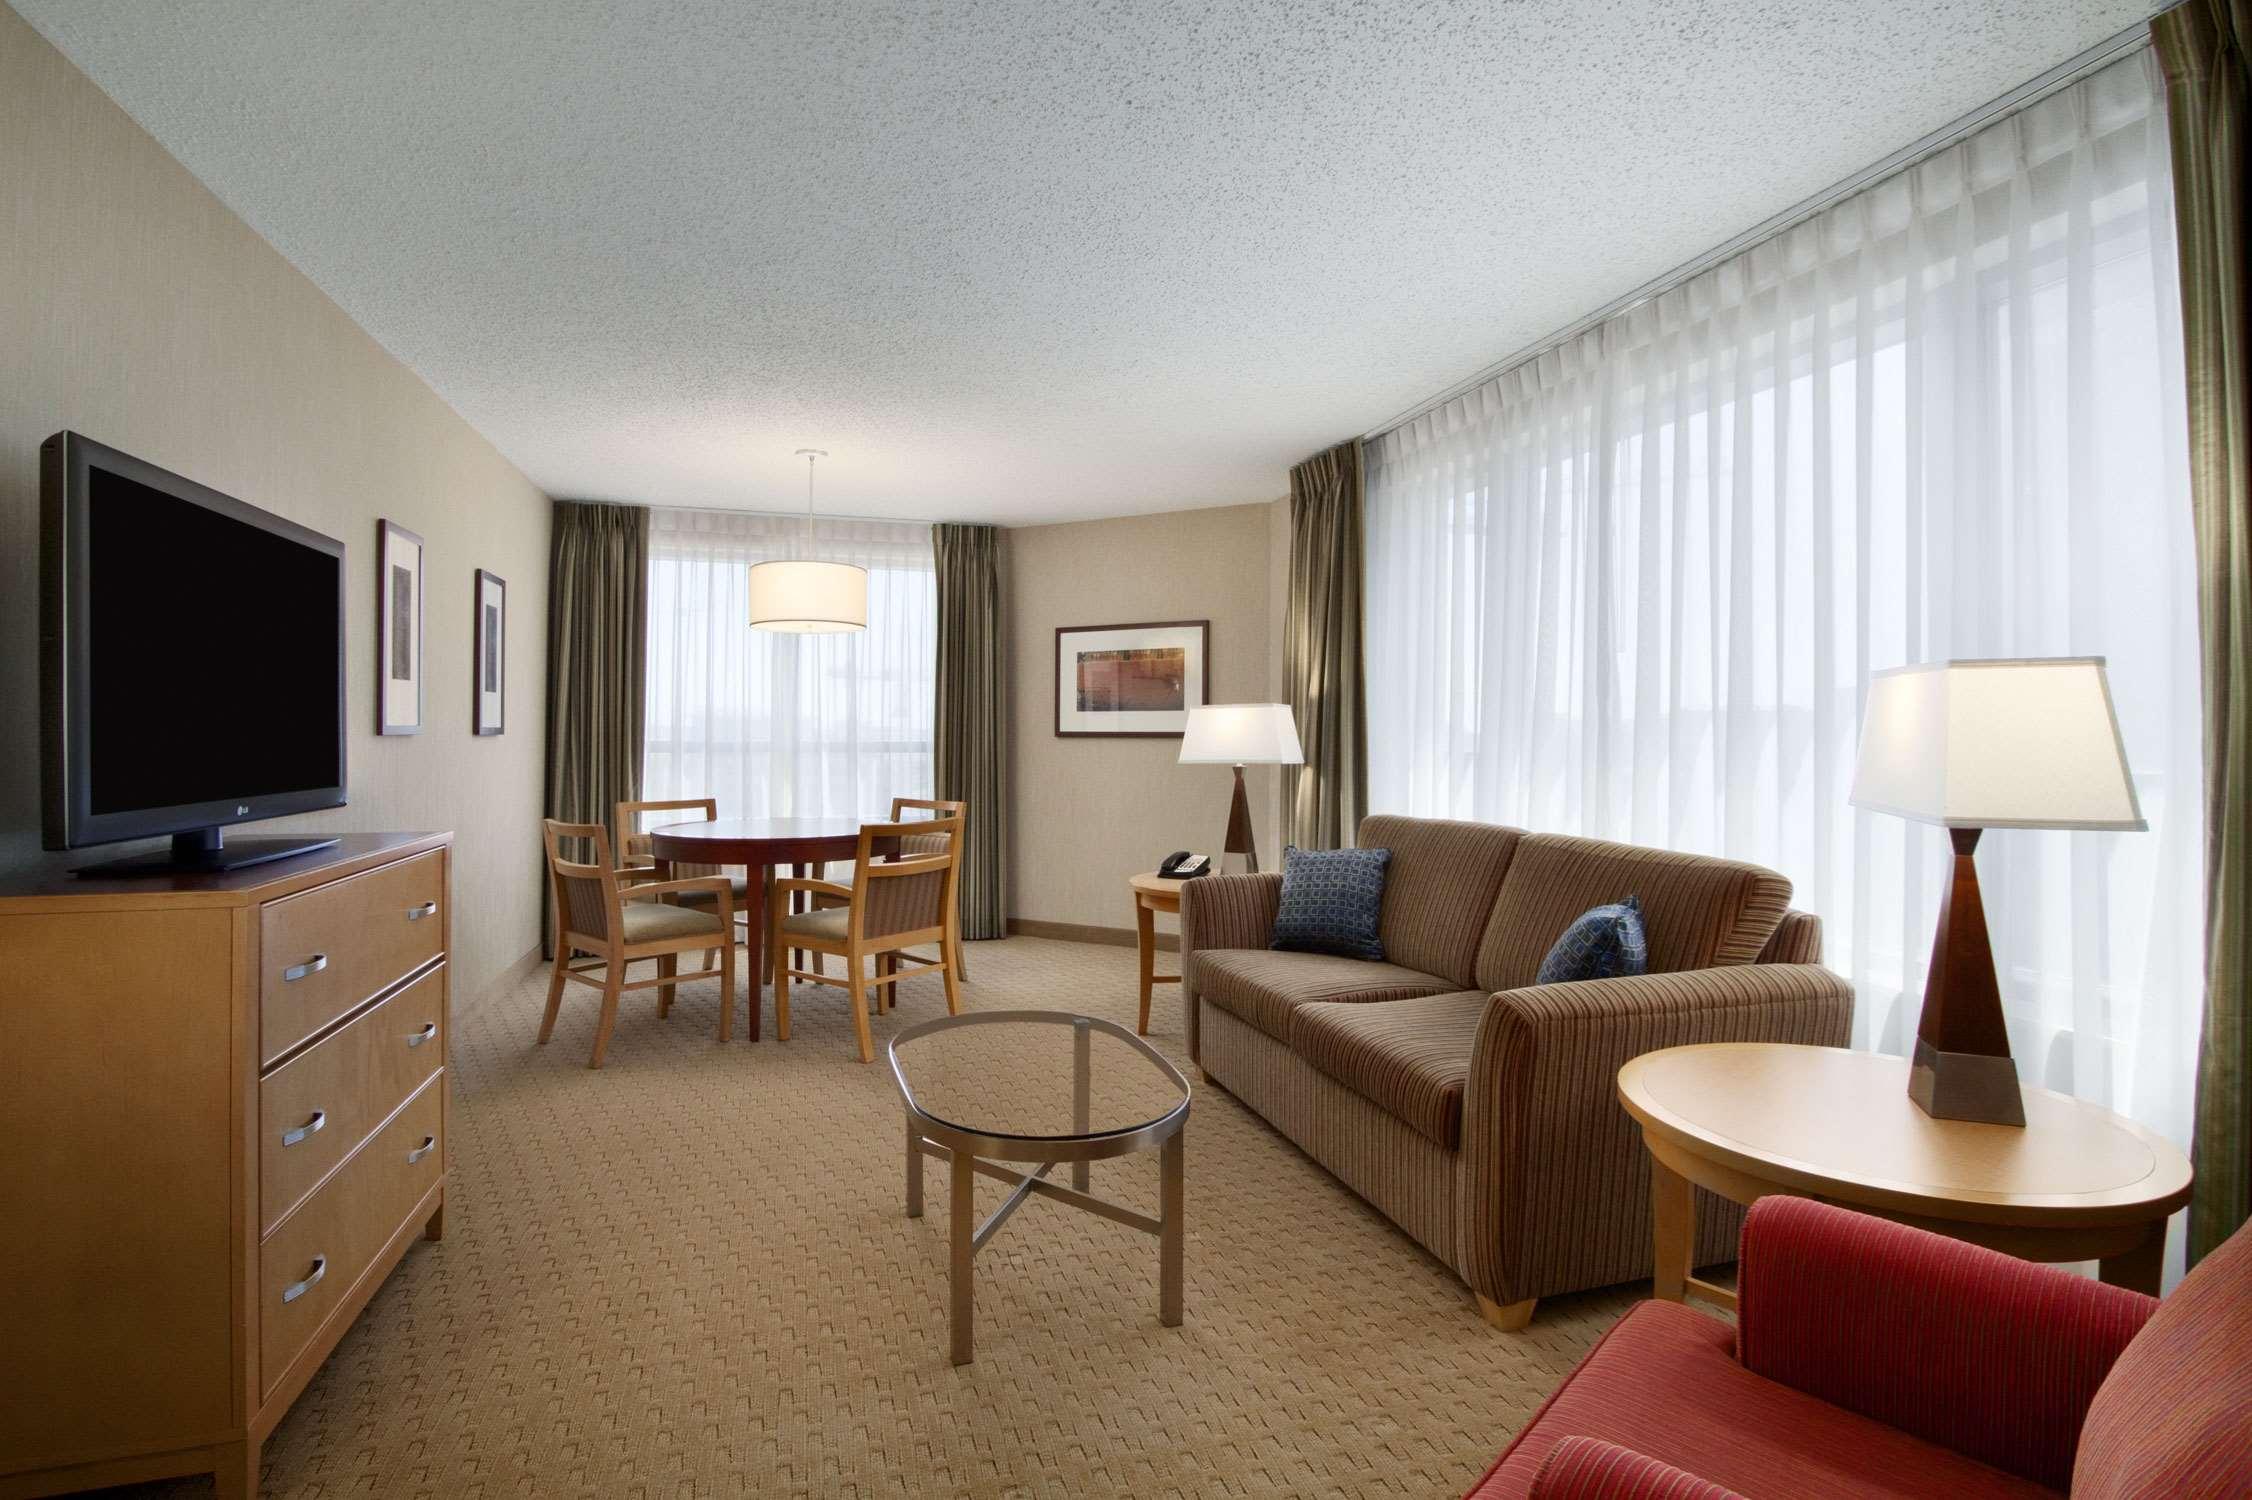 Embassy Suites by Hilton Washington DC Convention Center image 24